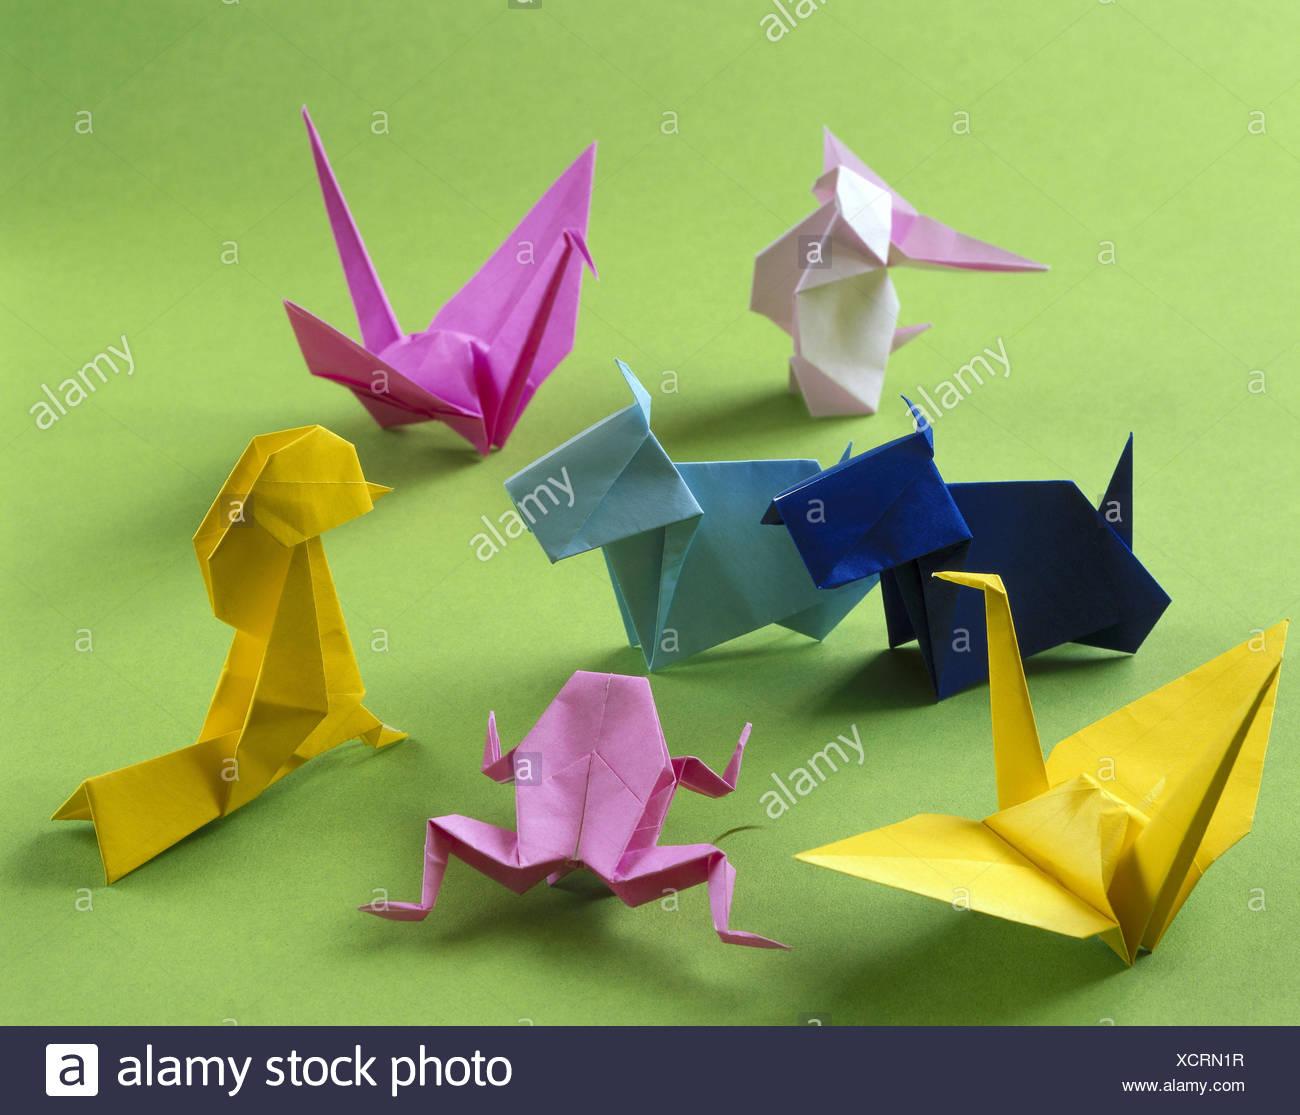 Origami Animals Stock Photos & Origami Animals Stock ... - photo#7